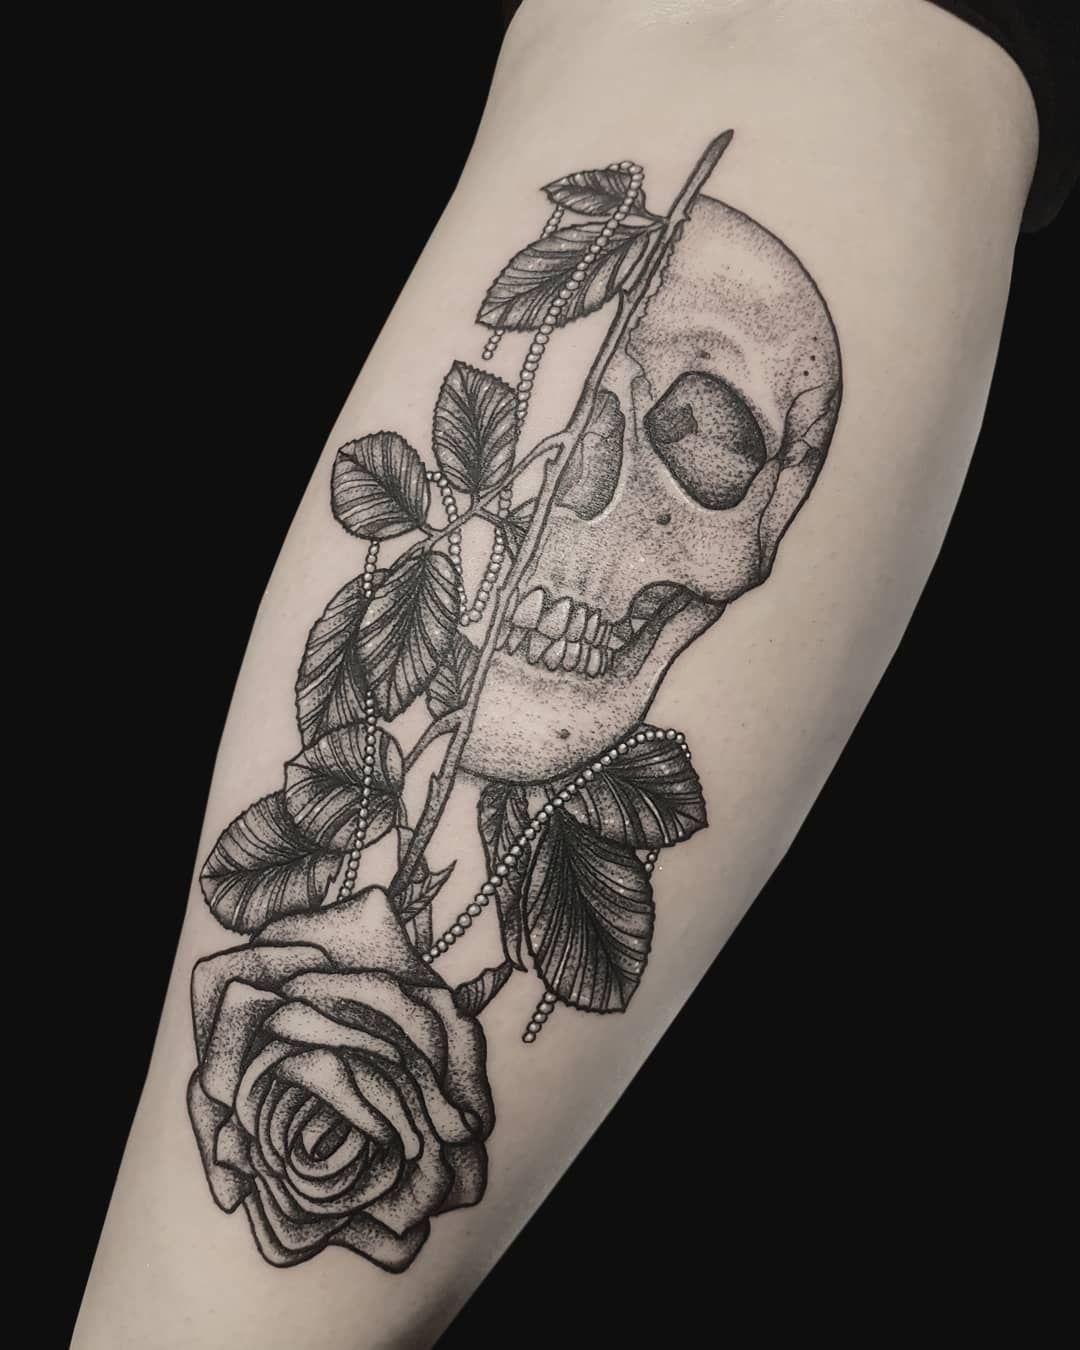 The Monumental Ink Tattoo Artists Tattoos Tattoo Artists Tattoo Artists Near Me